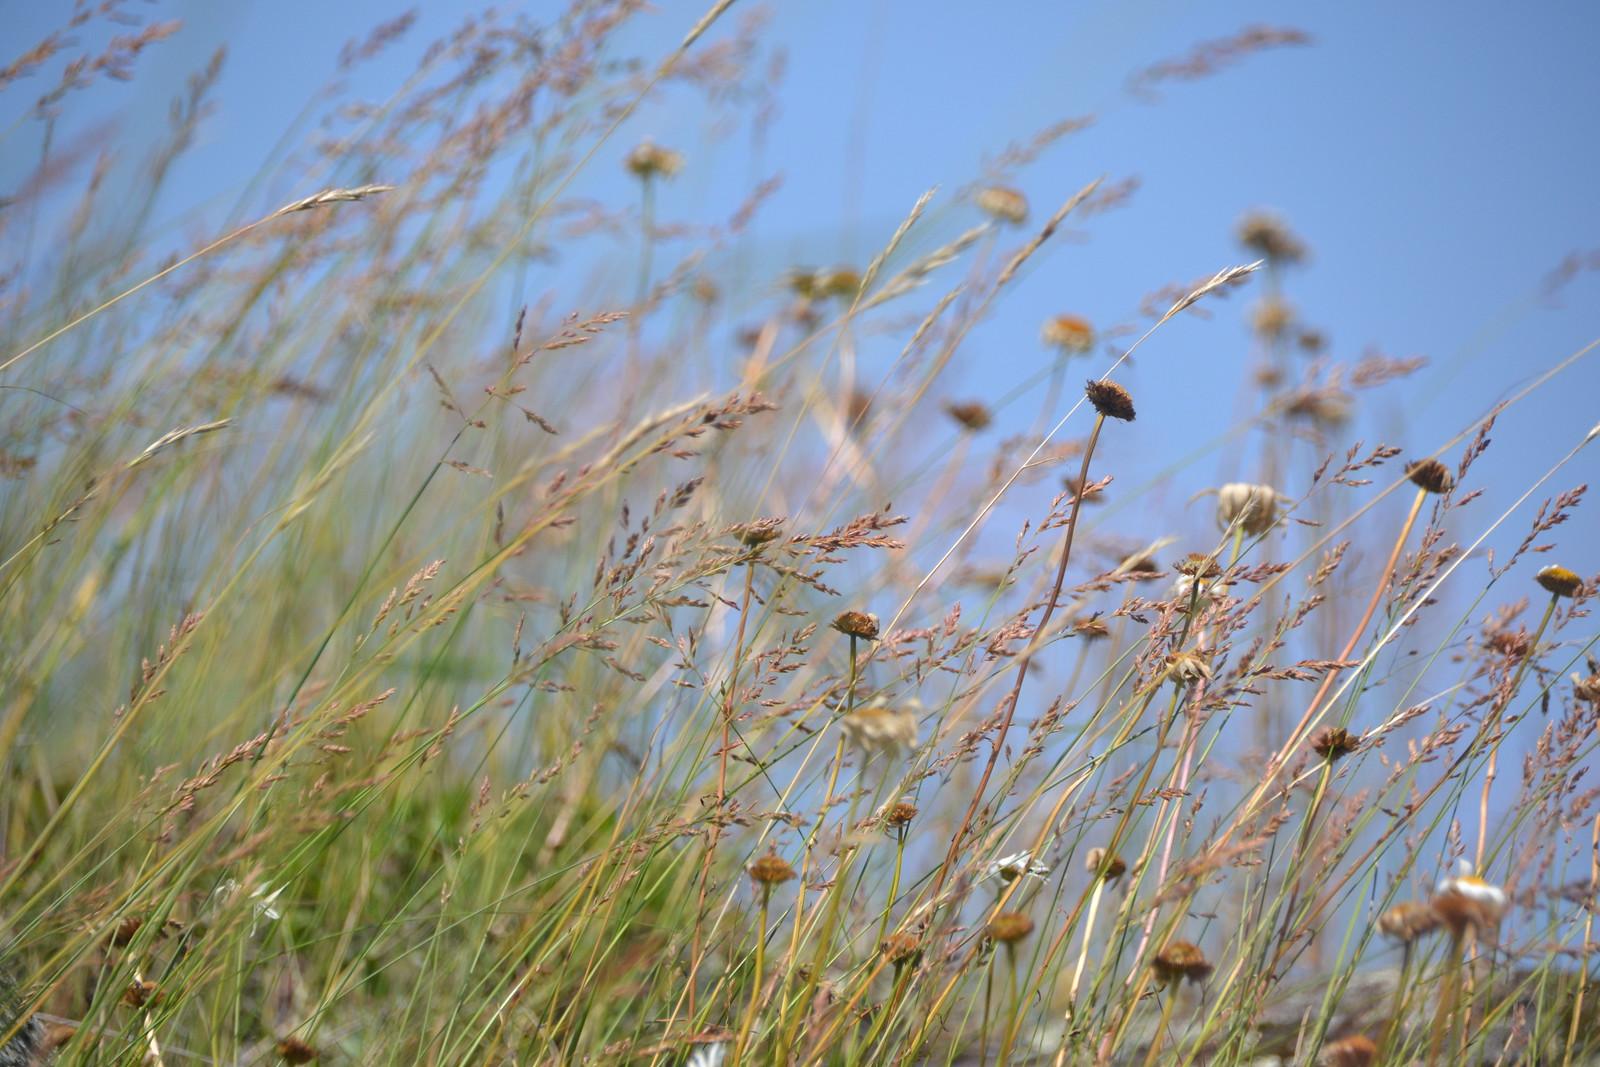 Beach Grass by Miriam Pickens